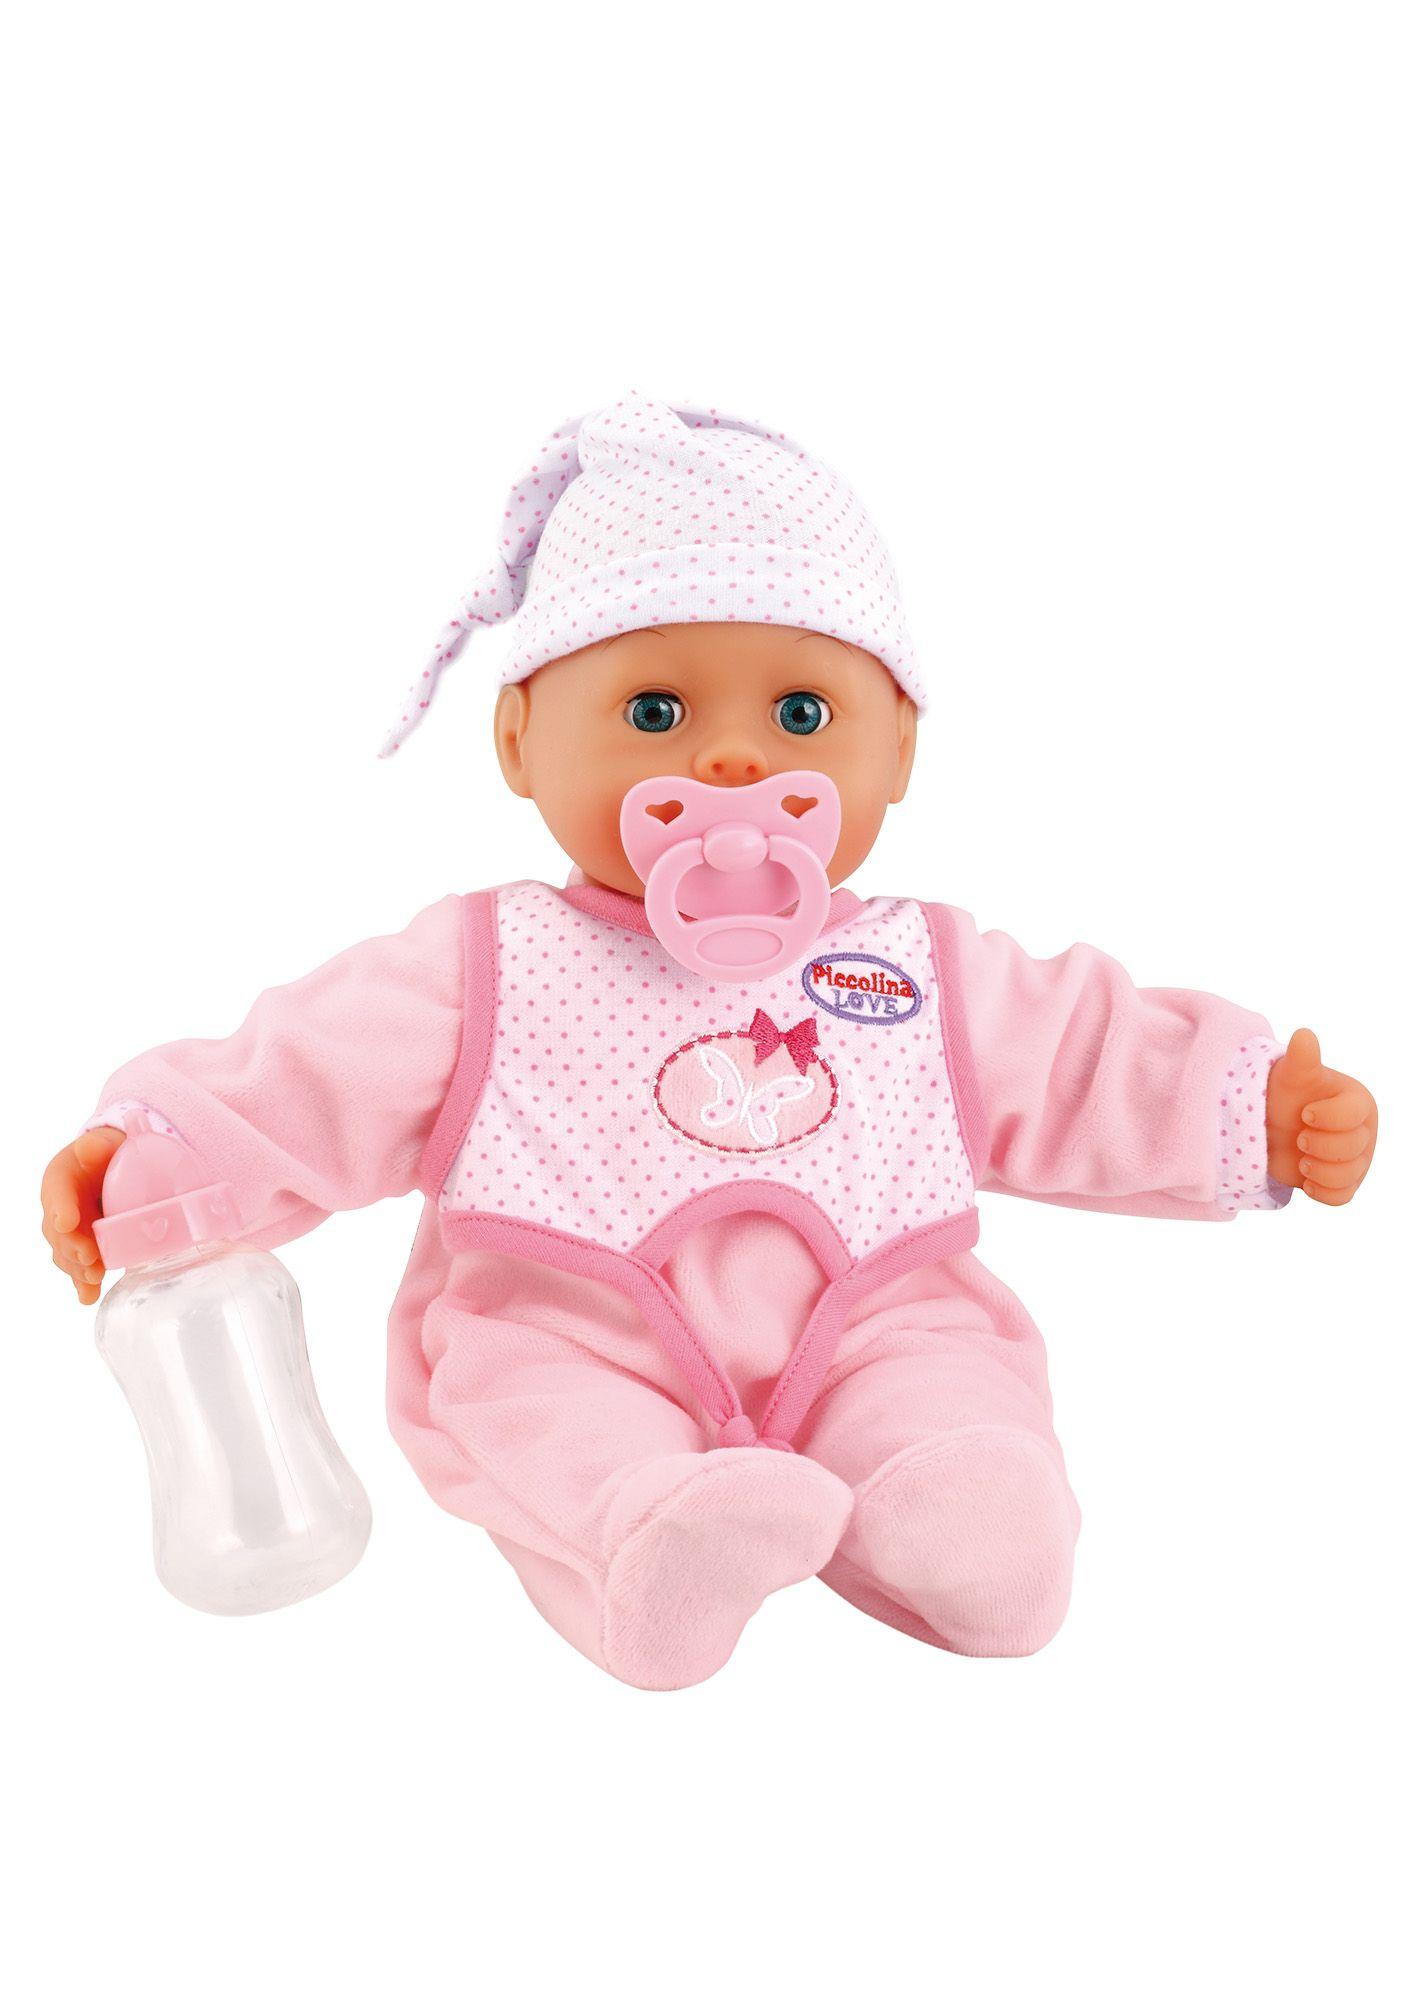 BAYER Bayer Design Babypuppe, »Piccolina - Laugh & Cry birthday Set«